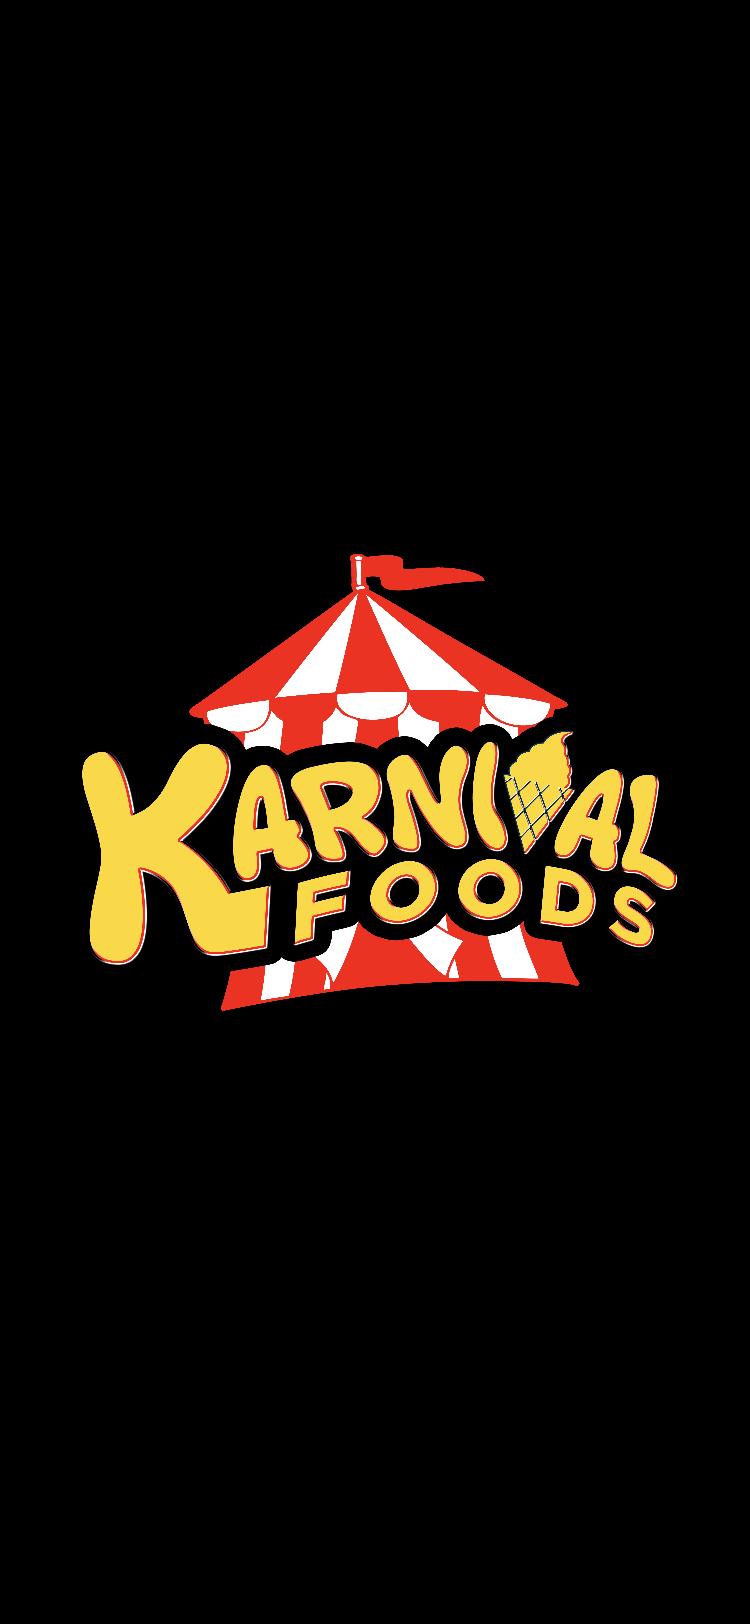 Karnival Foods